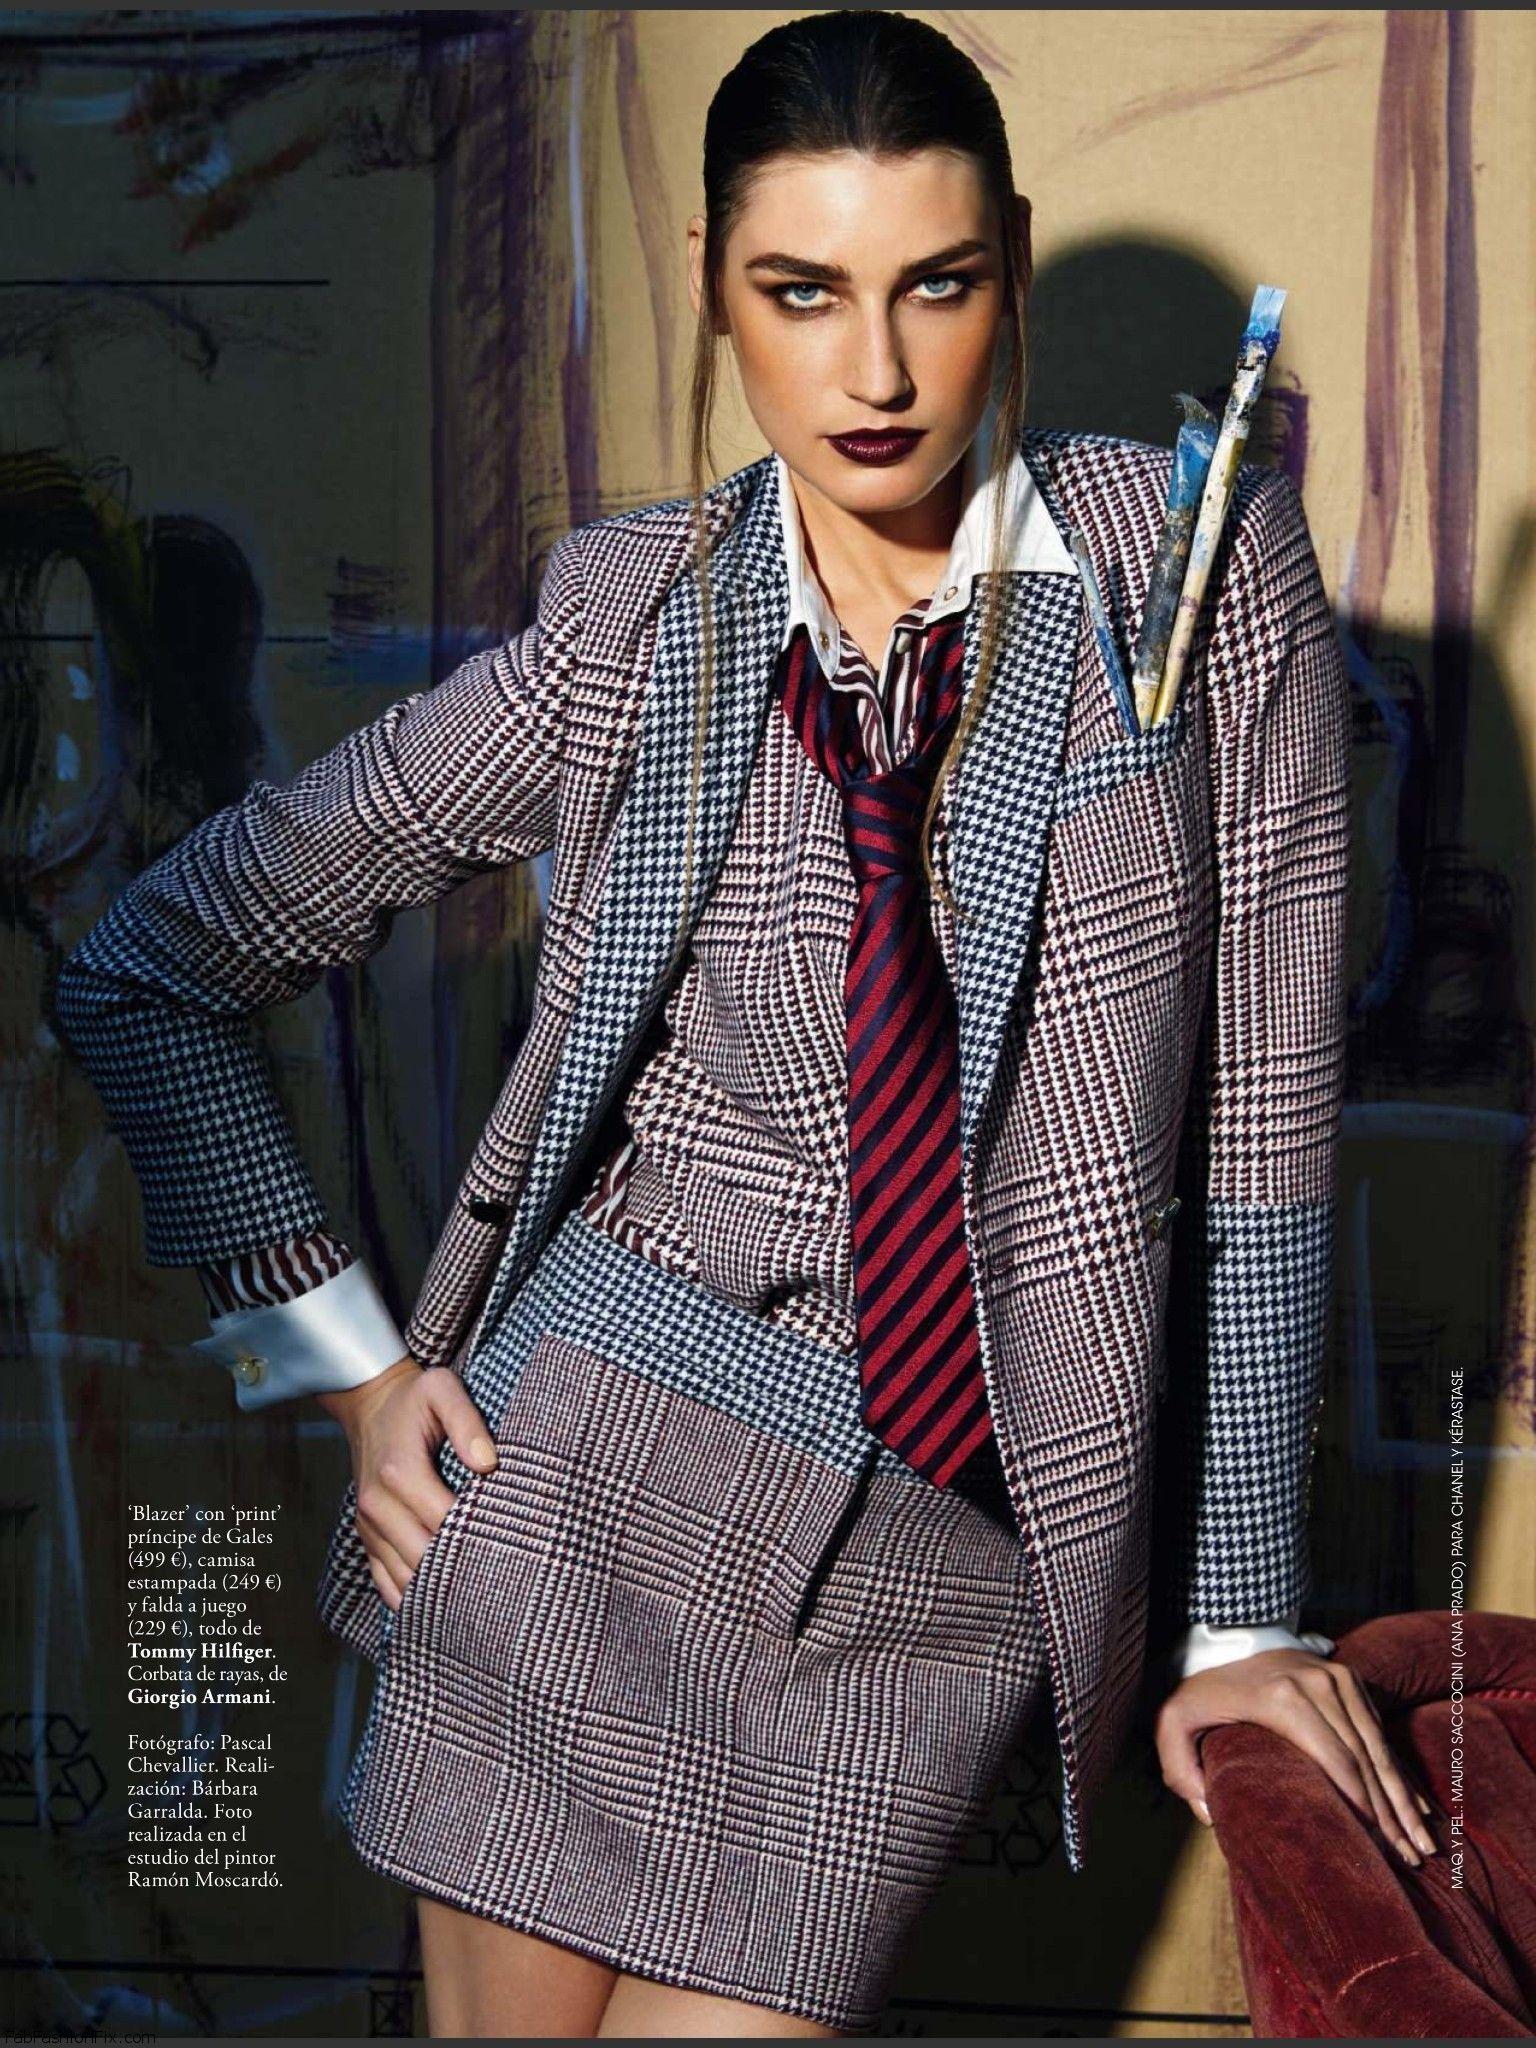 fashion_scans_remastered-eugenia_volodina-elle_espana-september_2013-scanned_by_vampirehorde-hq-15